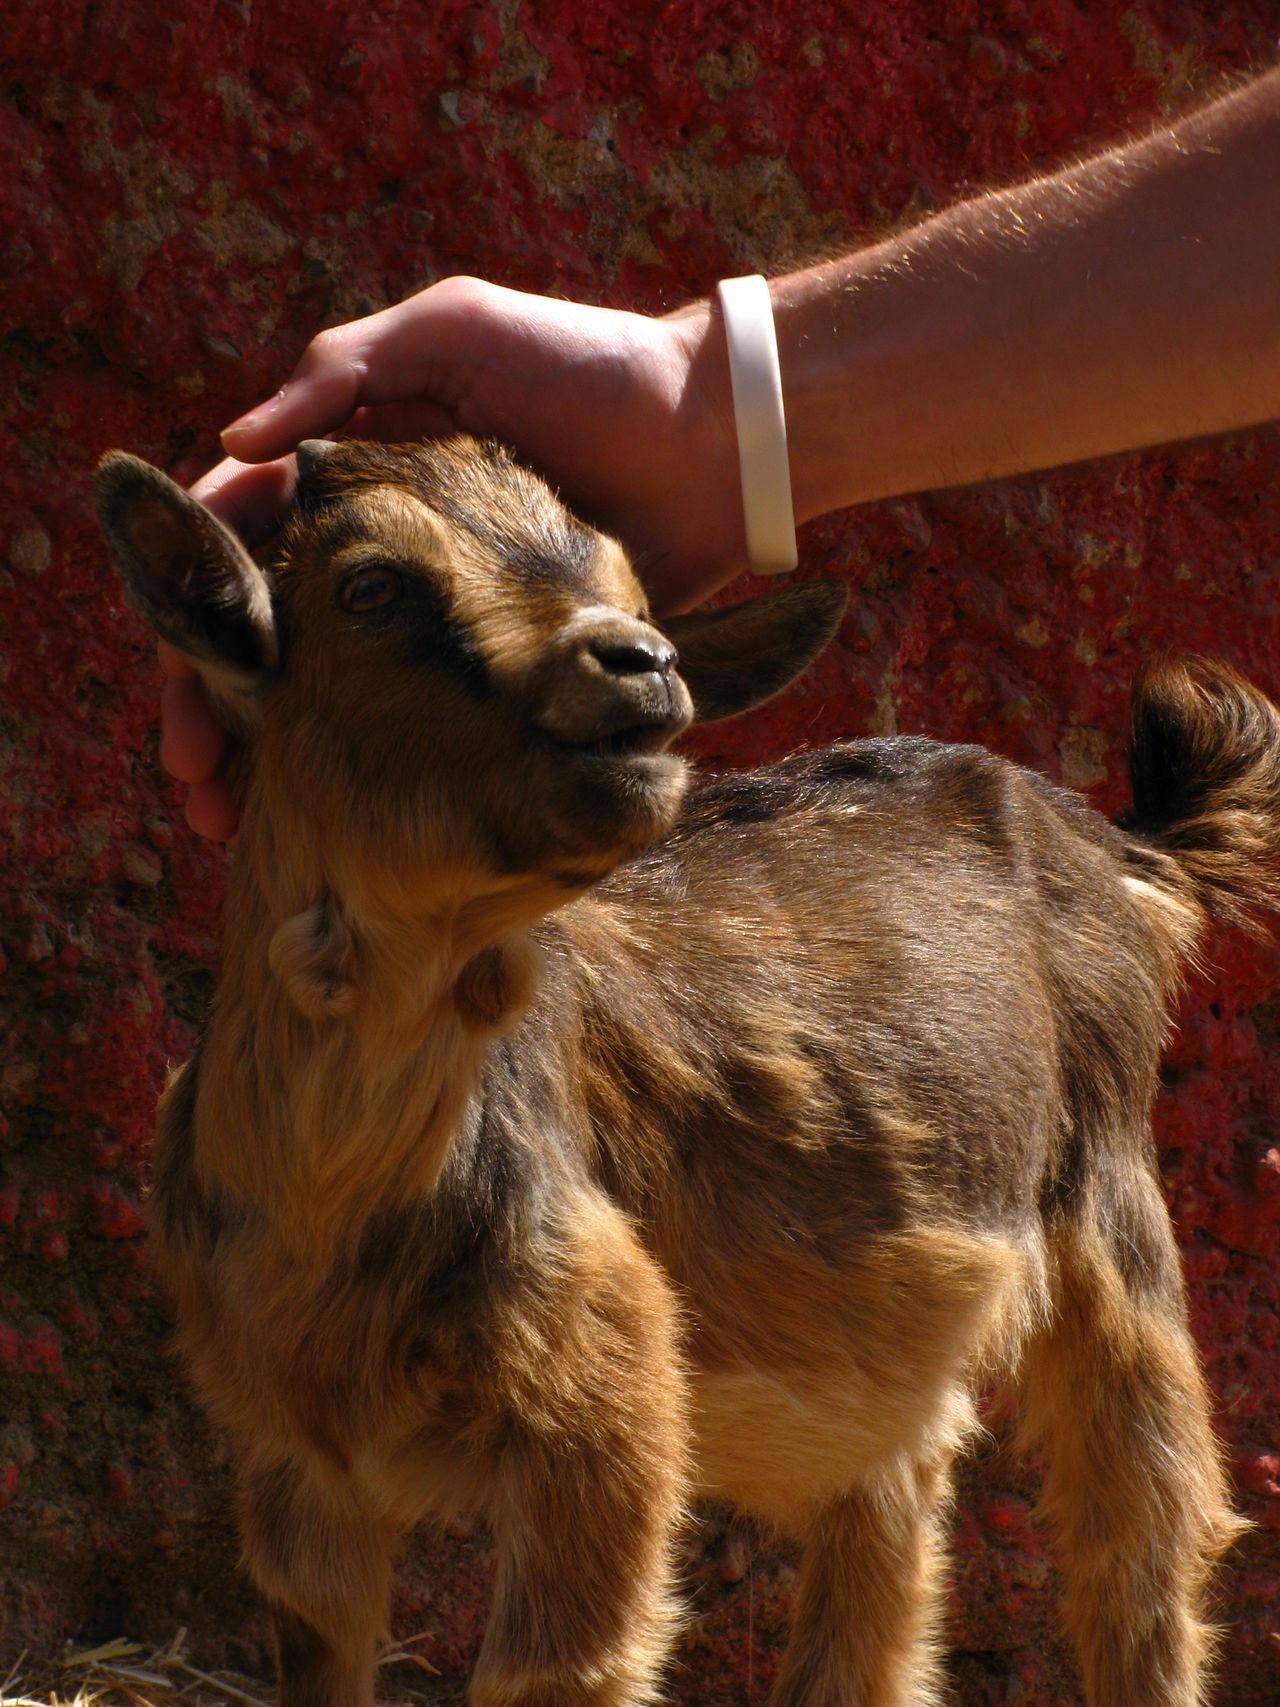 Beautiful stock photos of goat, Animal Themes, Day, Domestic Animals, Goat